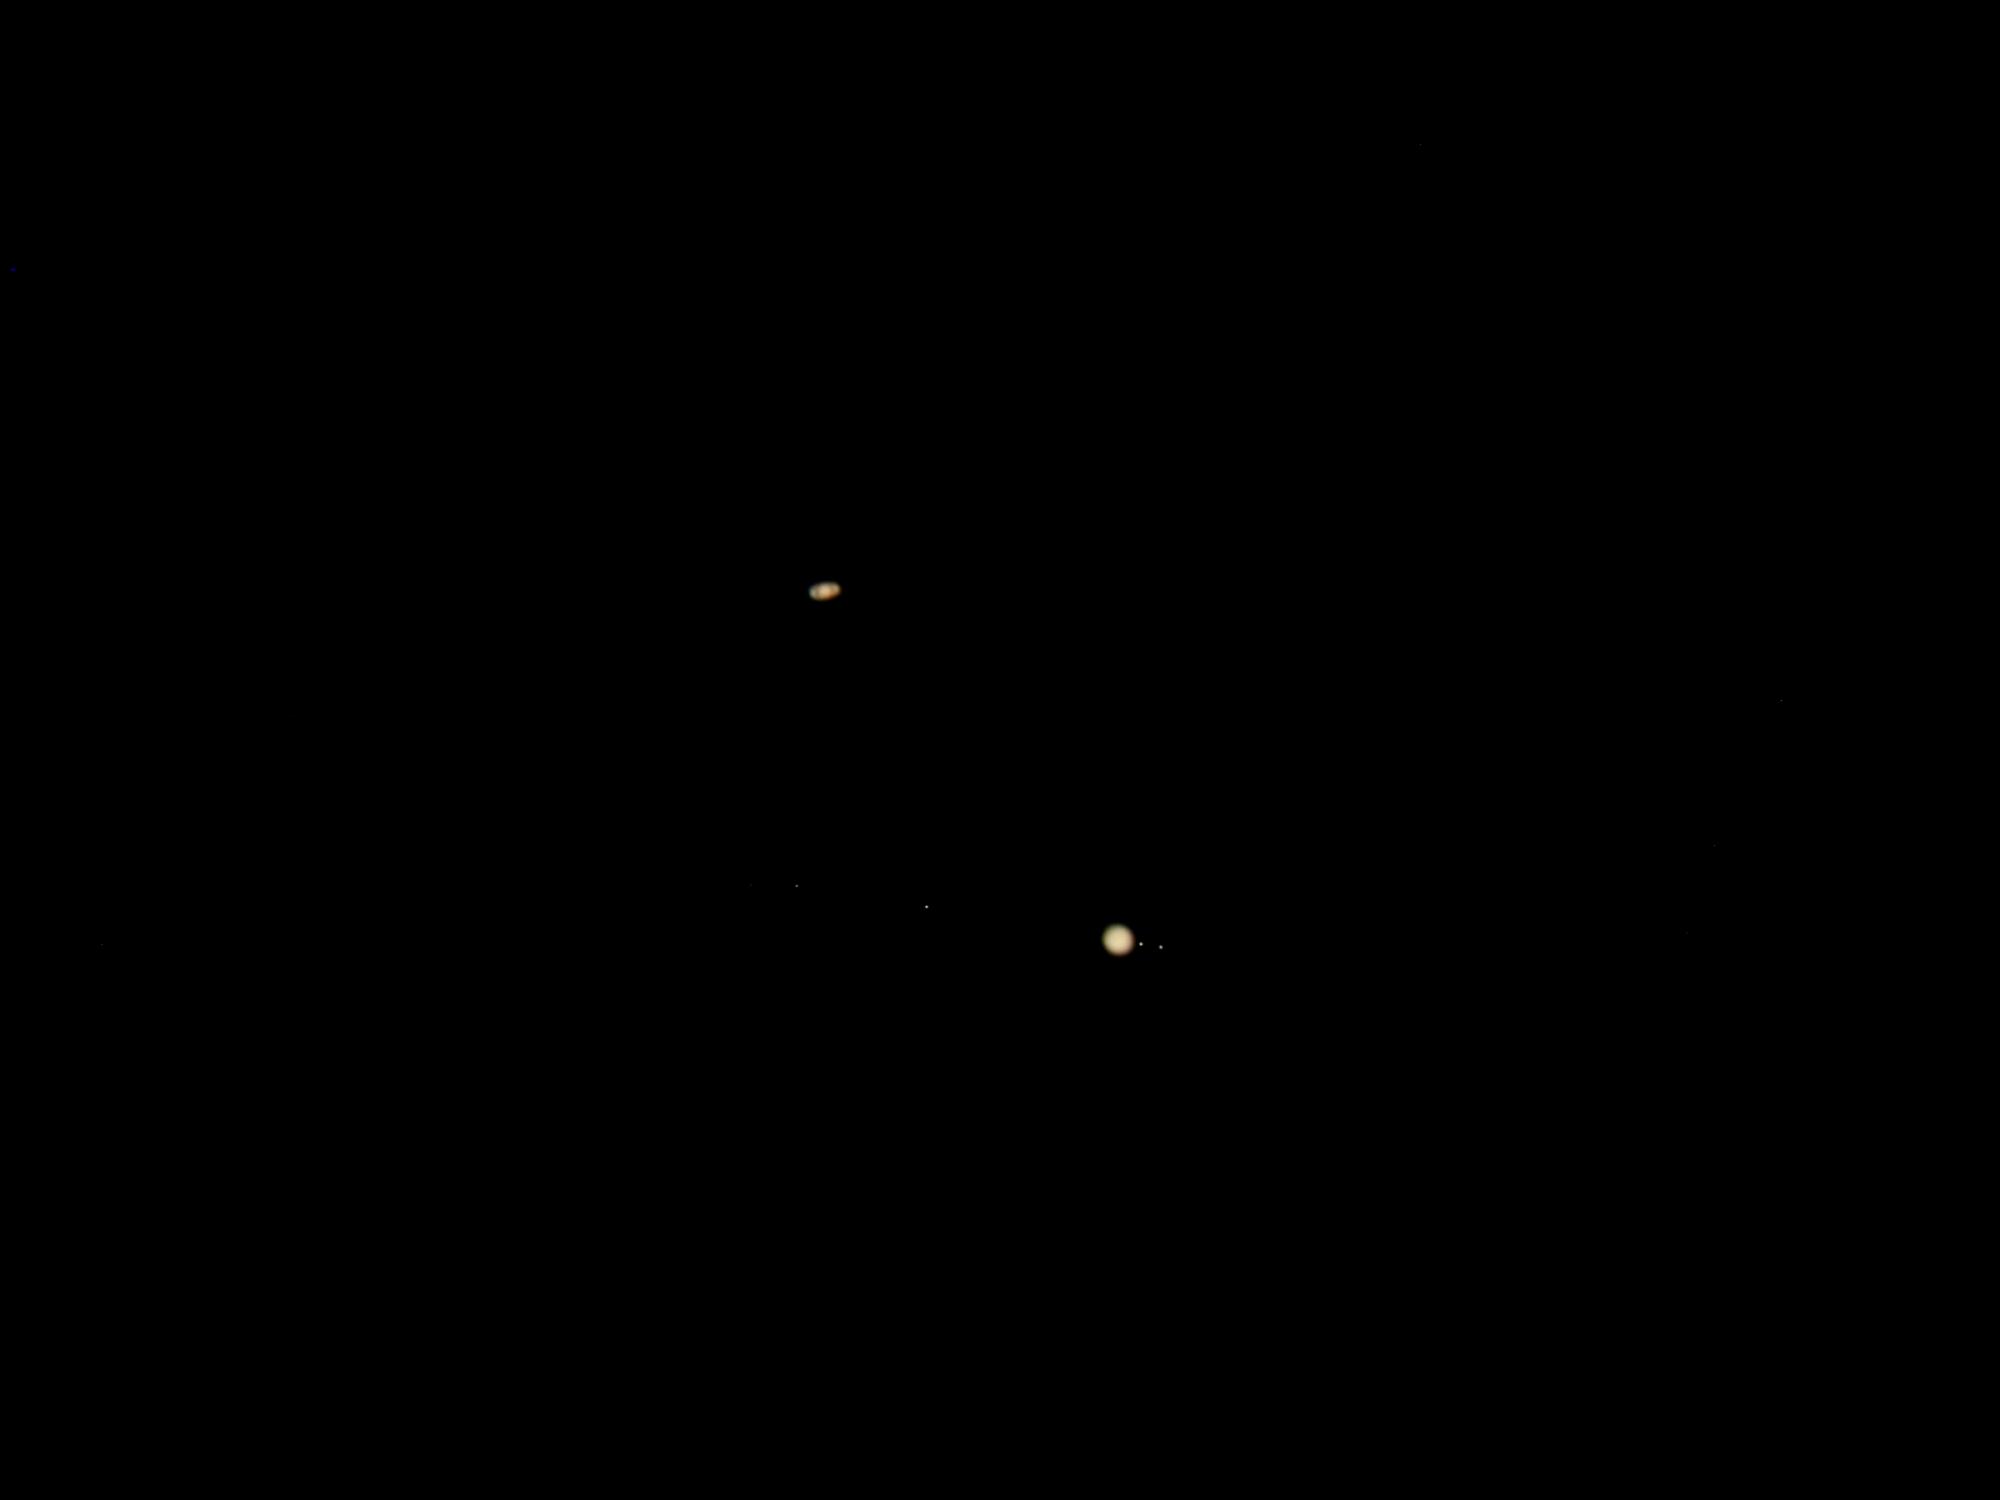 SaturneJujuSatellitesCrop.thumb.png.a8613d0dda4d86627b53f4c18f48cfe4.png